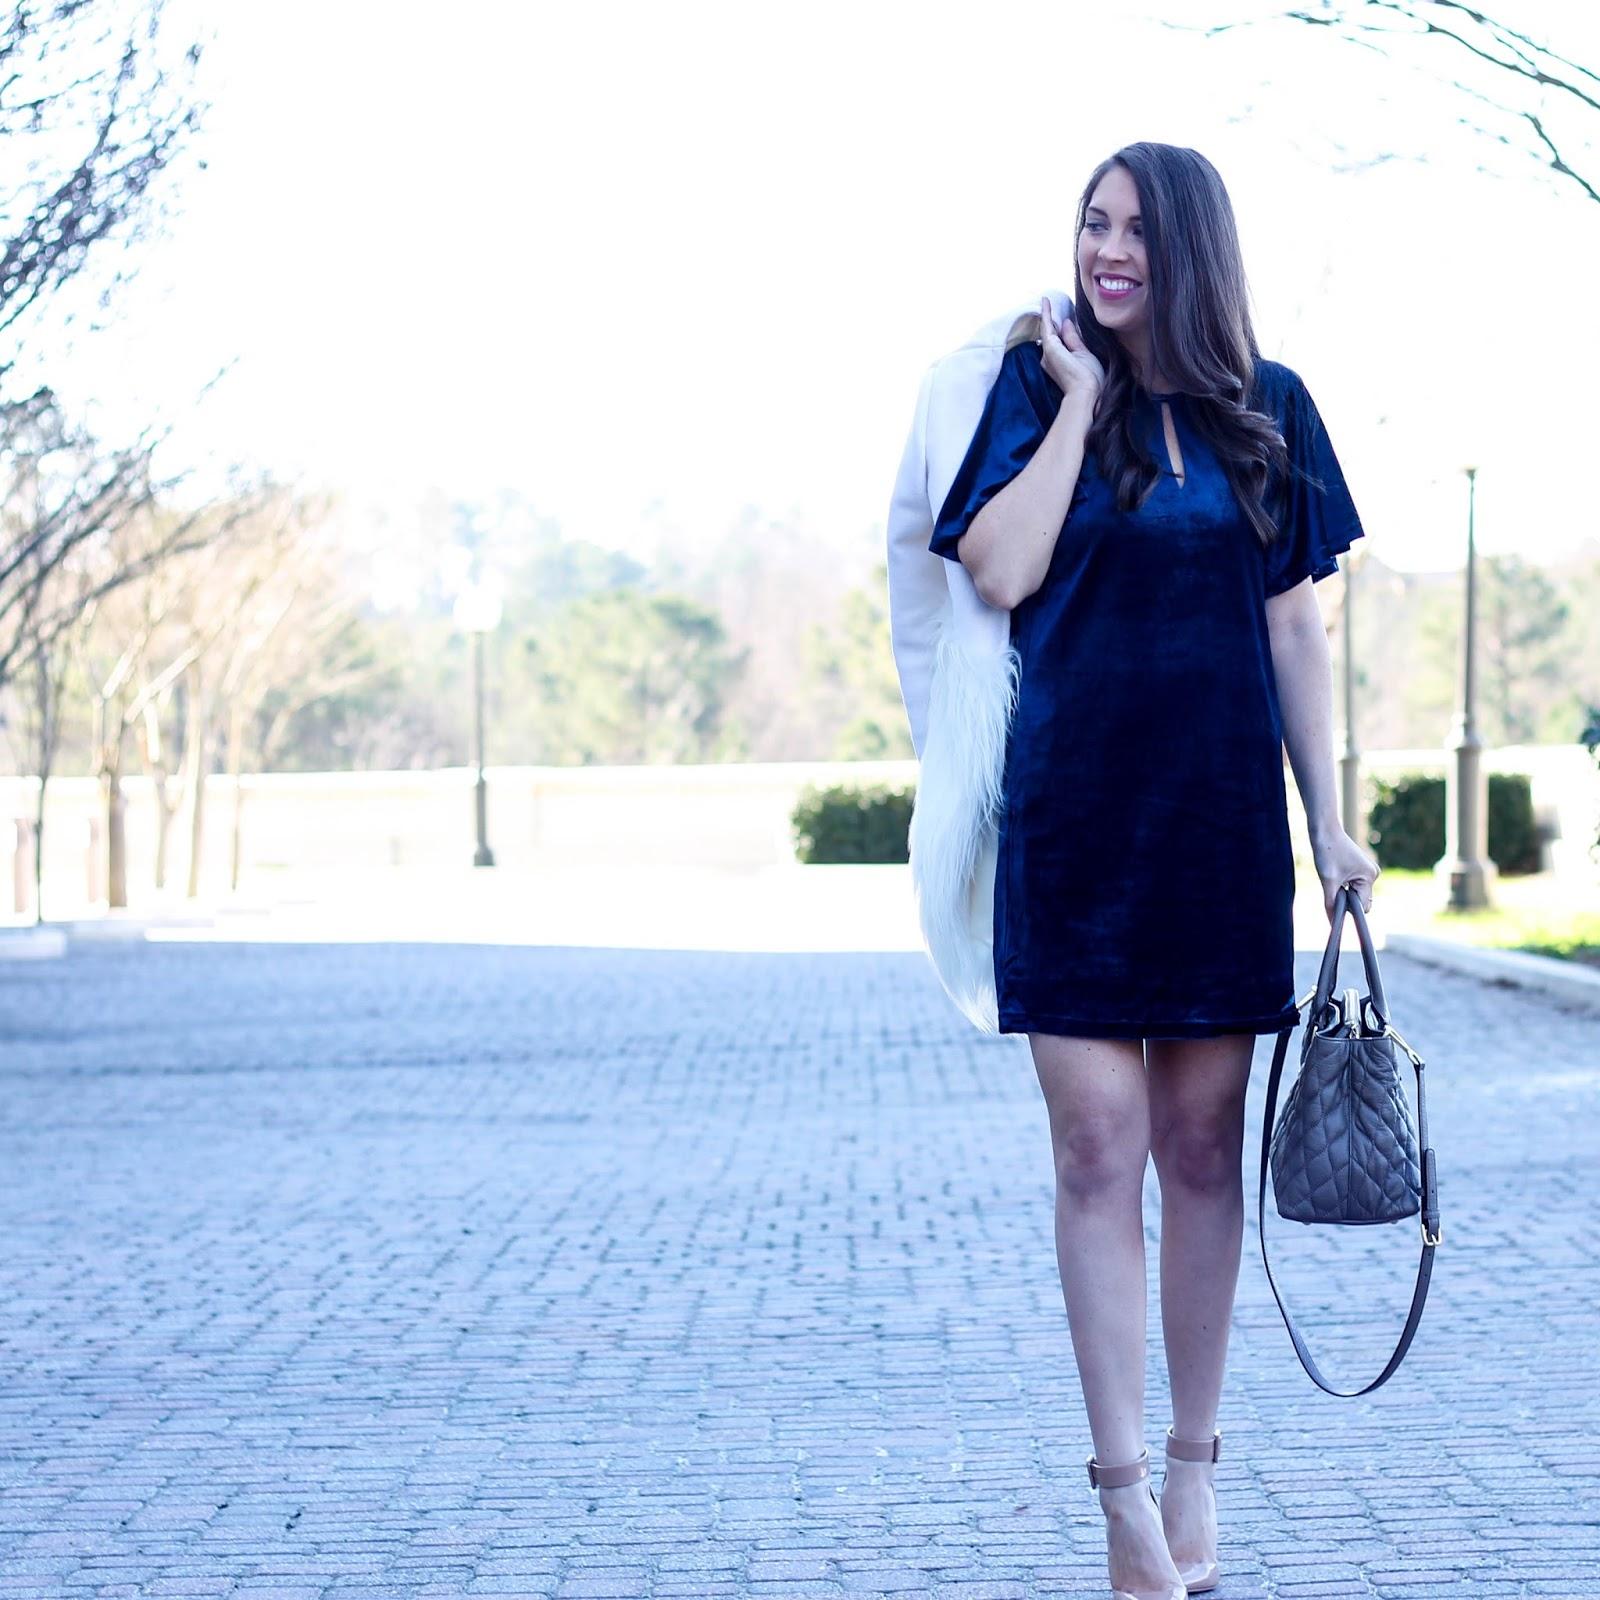 Velvet Navy Shift Dress, Velvet Dress, Blue velvet, White Faux Fur Coat, Chicwish White Faux Fur Coat, Fashion Blogger, Winter Style, Winter Trends, Pretty in the Pines, Cute Winter Outfit Idea, Nude Ankle Strap Pumps